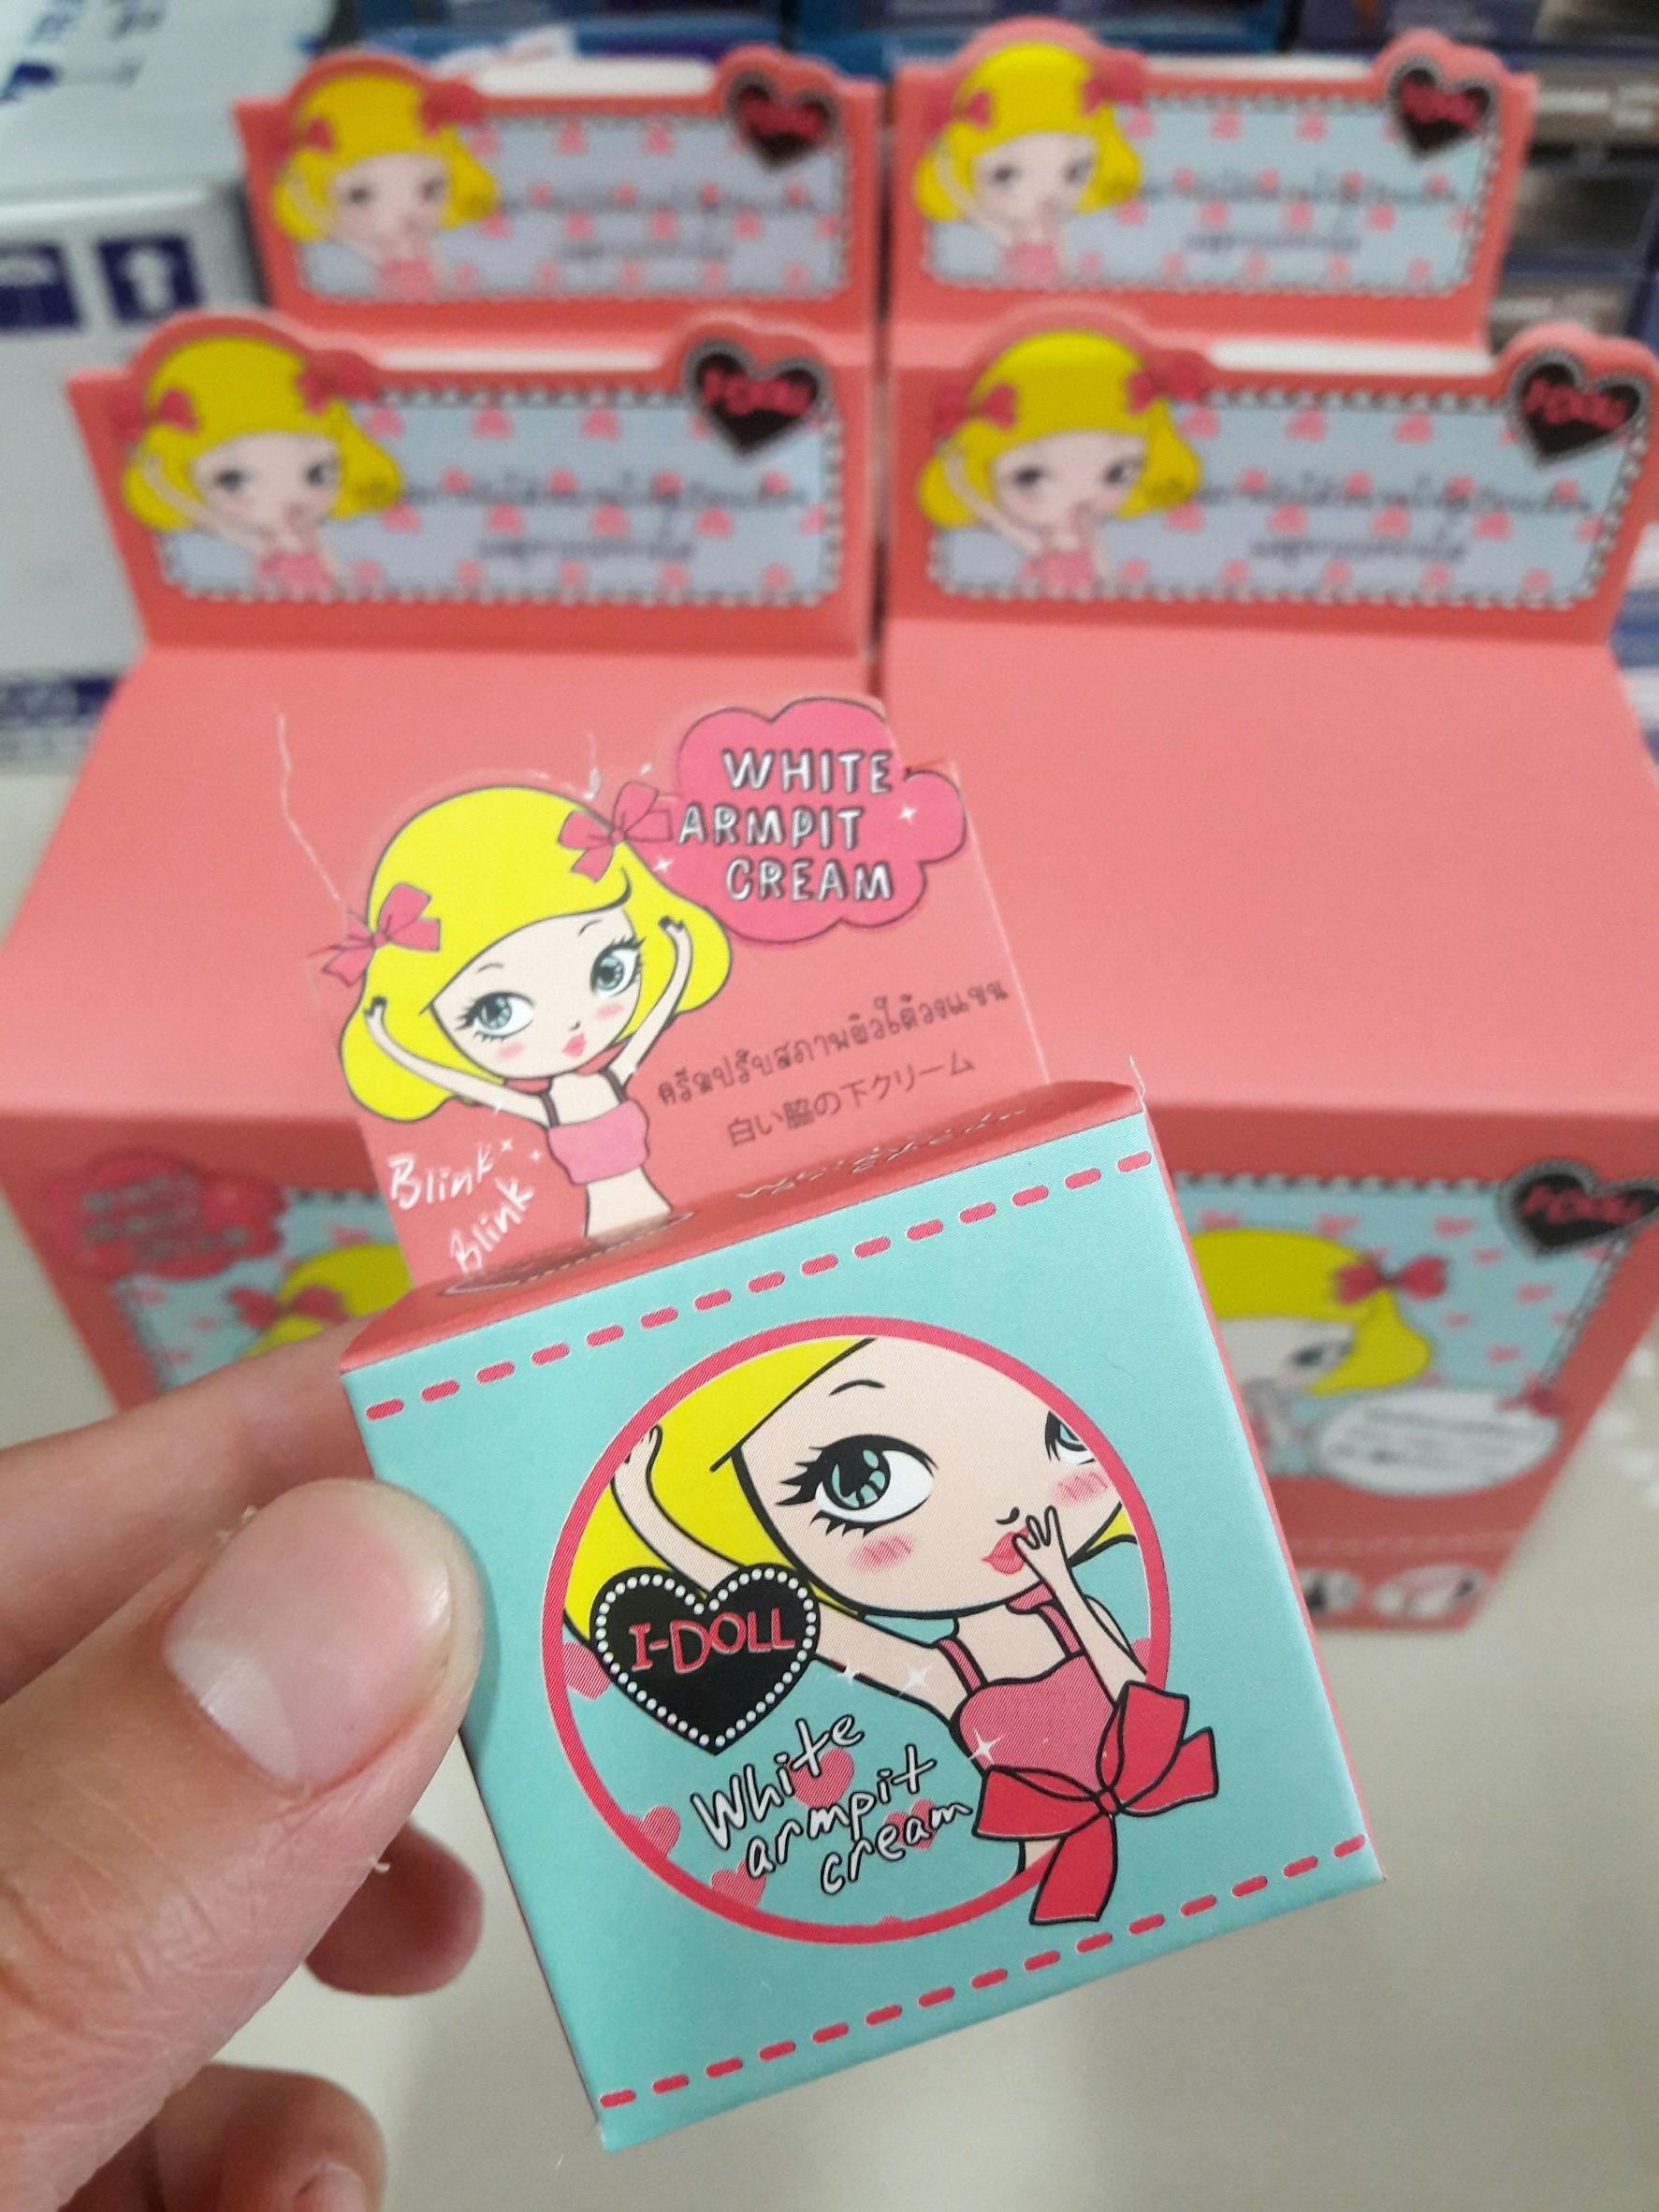 I-Doll White Armpit Cream 5g ครีมทารักแร้ขาว 5 กรัม